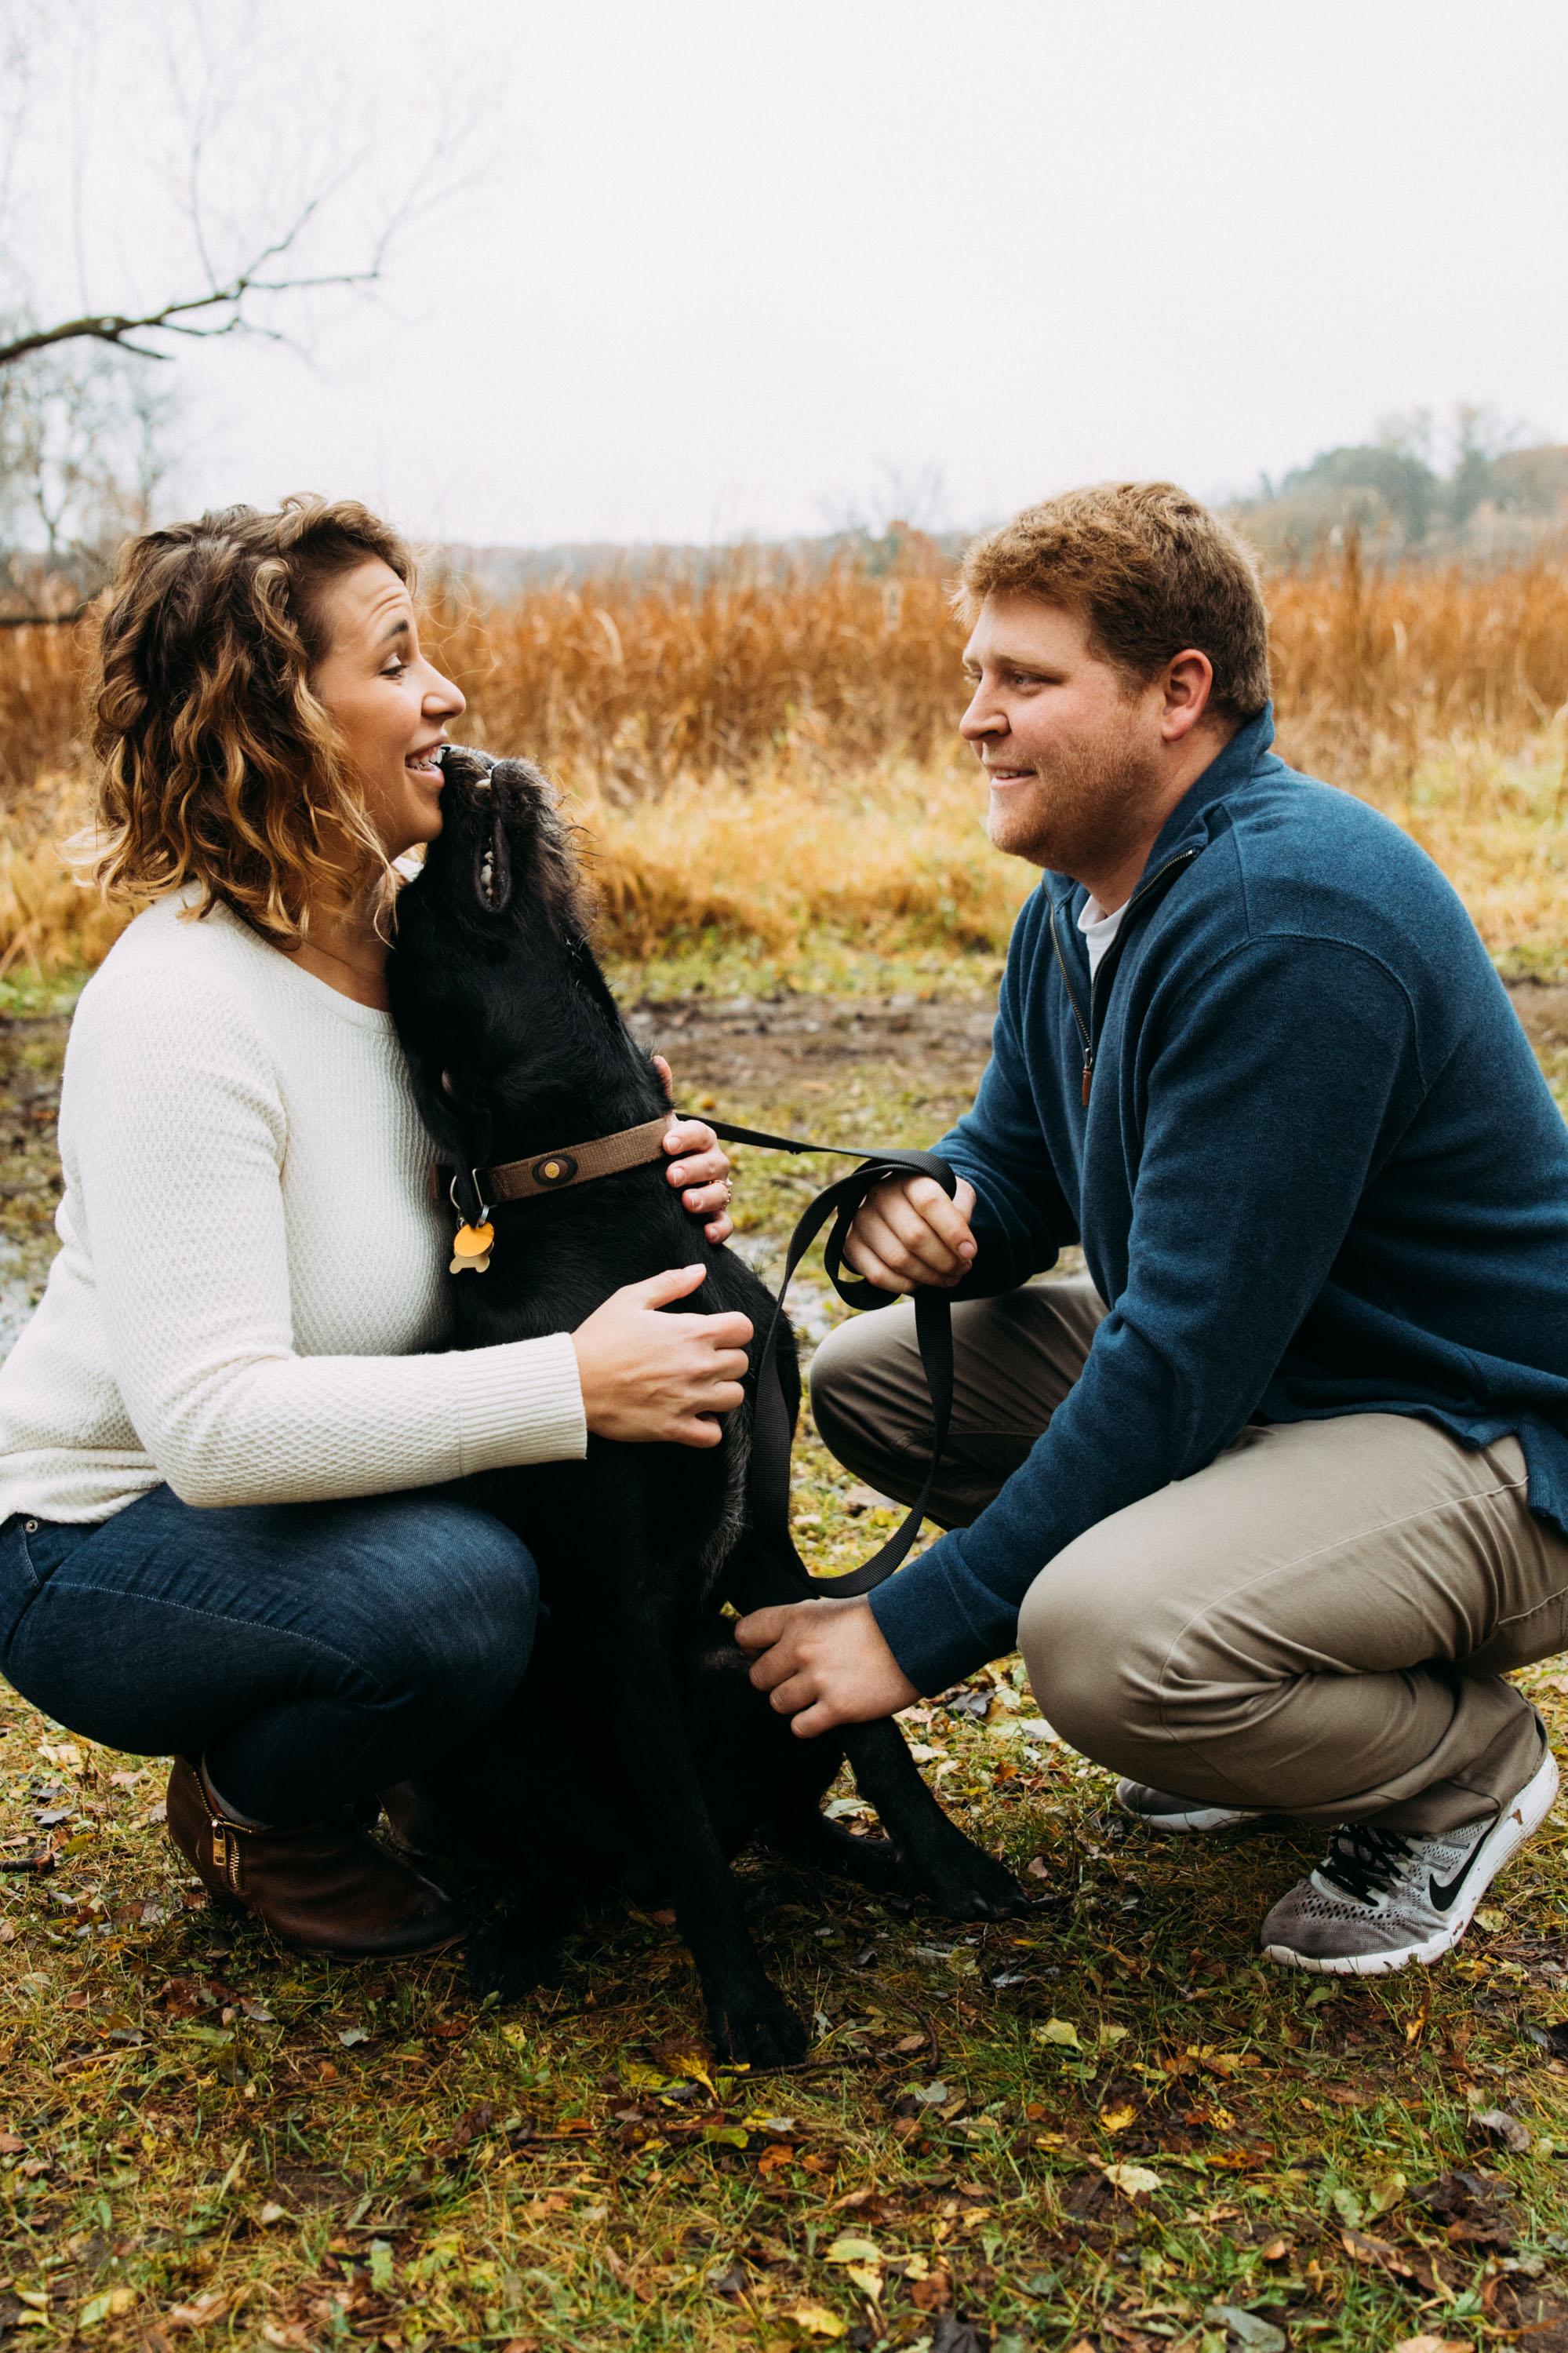 4-Dogs_at_Engagement_Photos_Minnesota.jpg